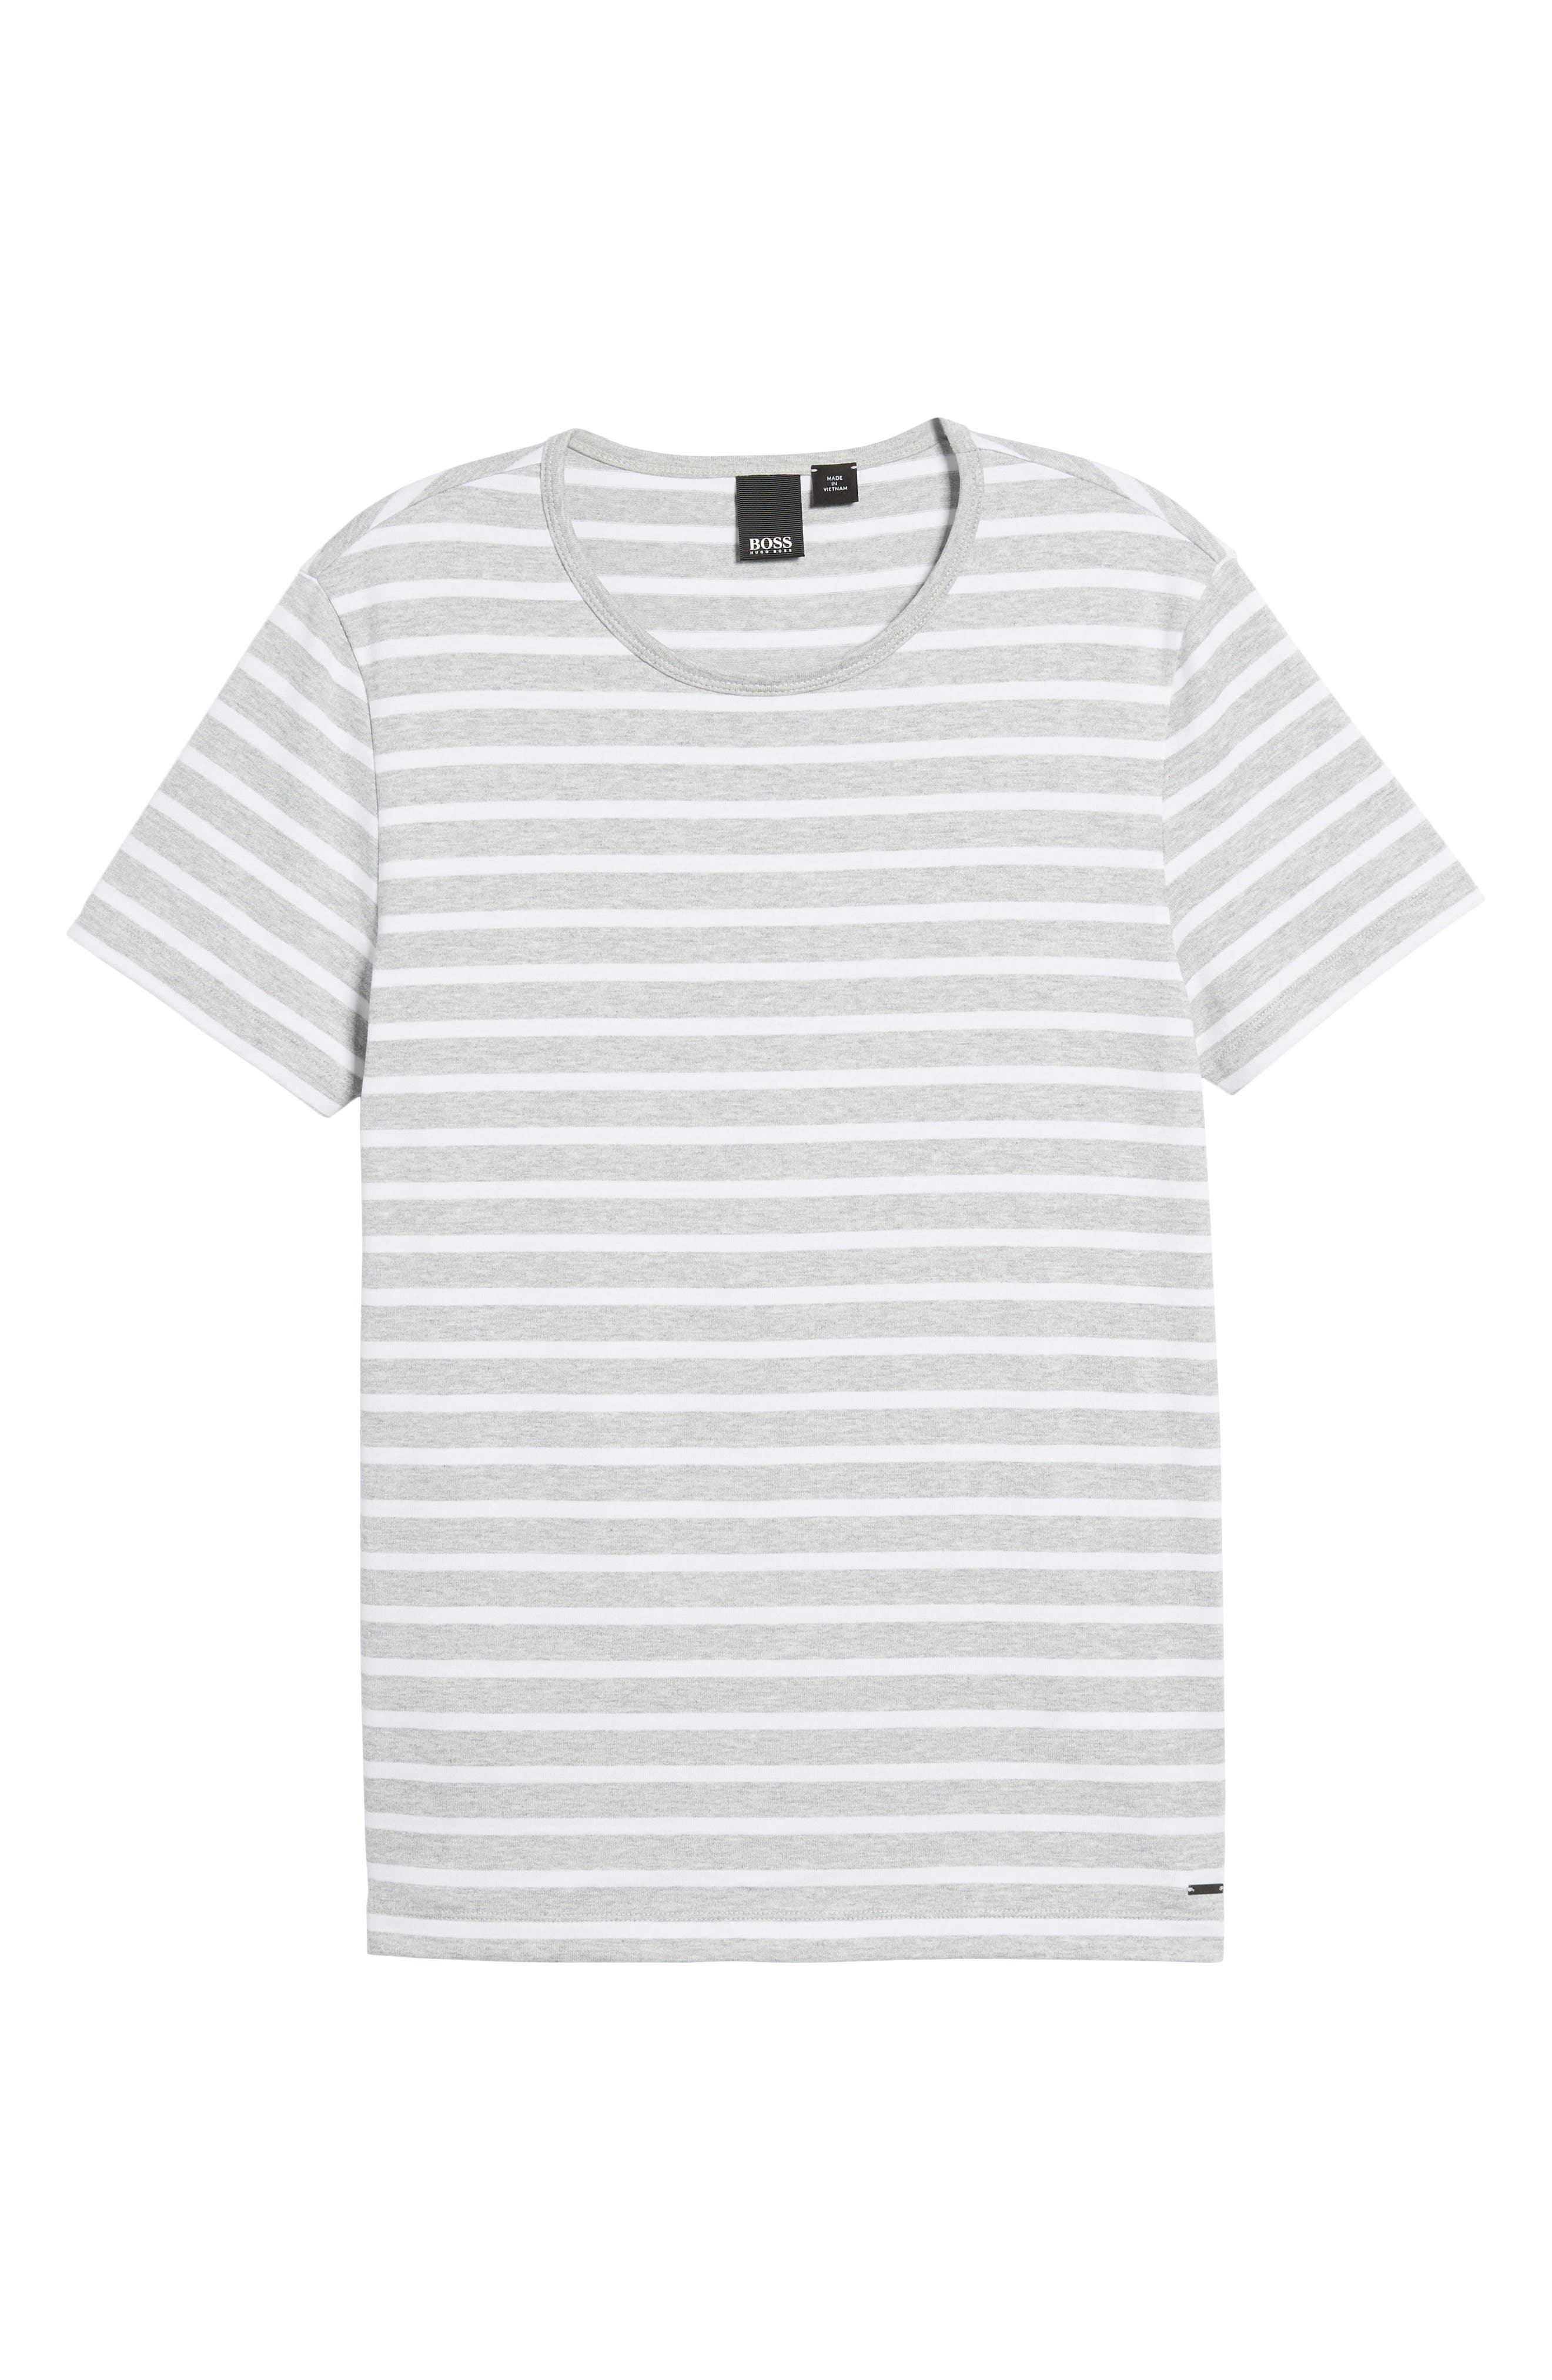 Tessler Slim Fit Crewneck T-Shirt,                             Alternate thumbnail 6, color,                             072